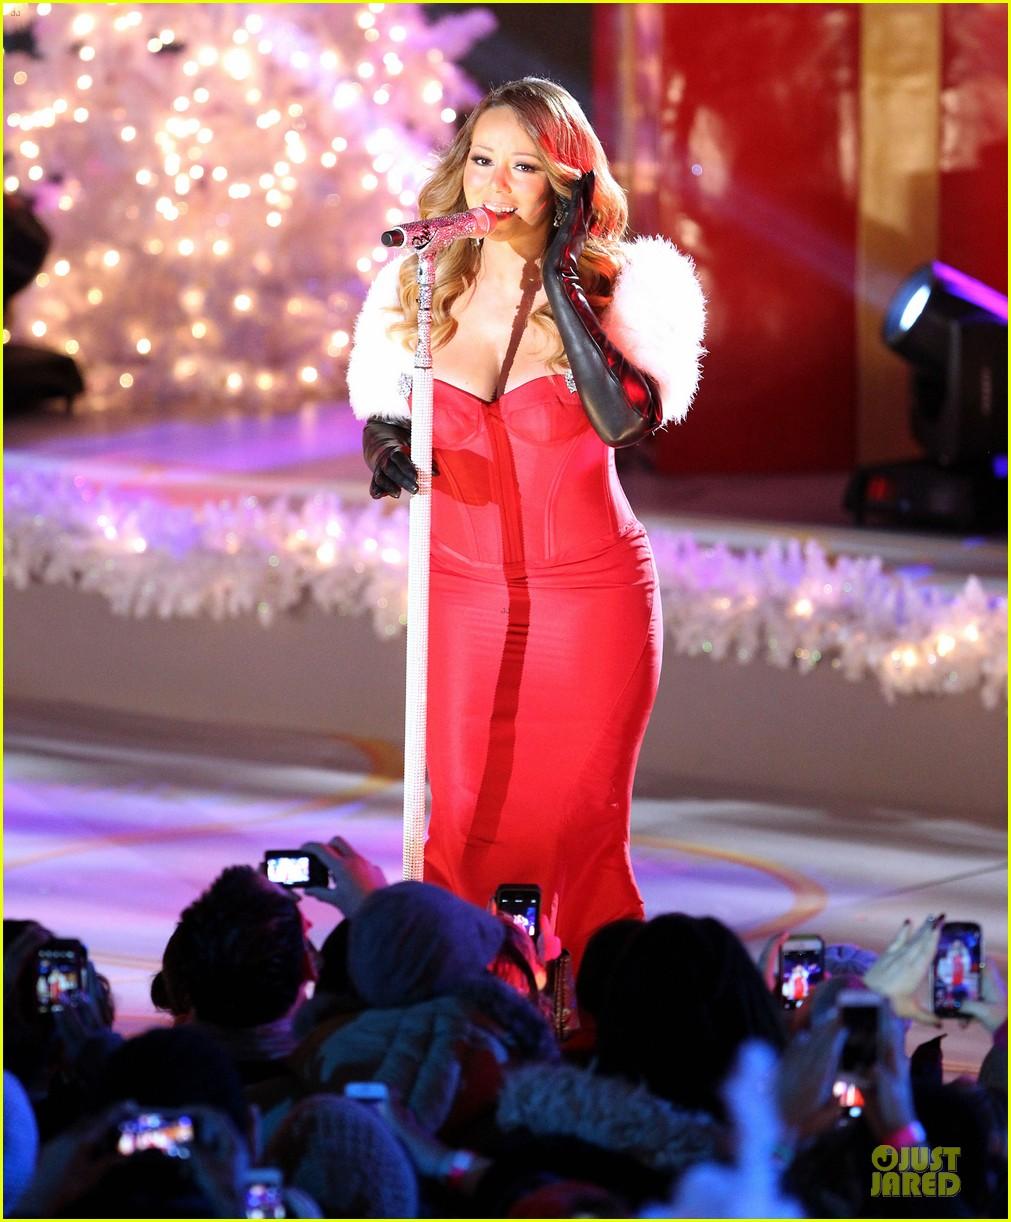 mariah carey rockfeller center christmas tree lighting 2013 performer 143004637